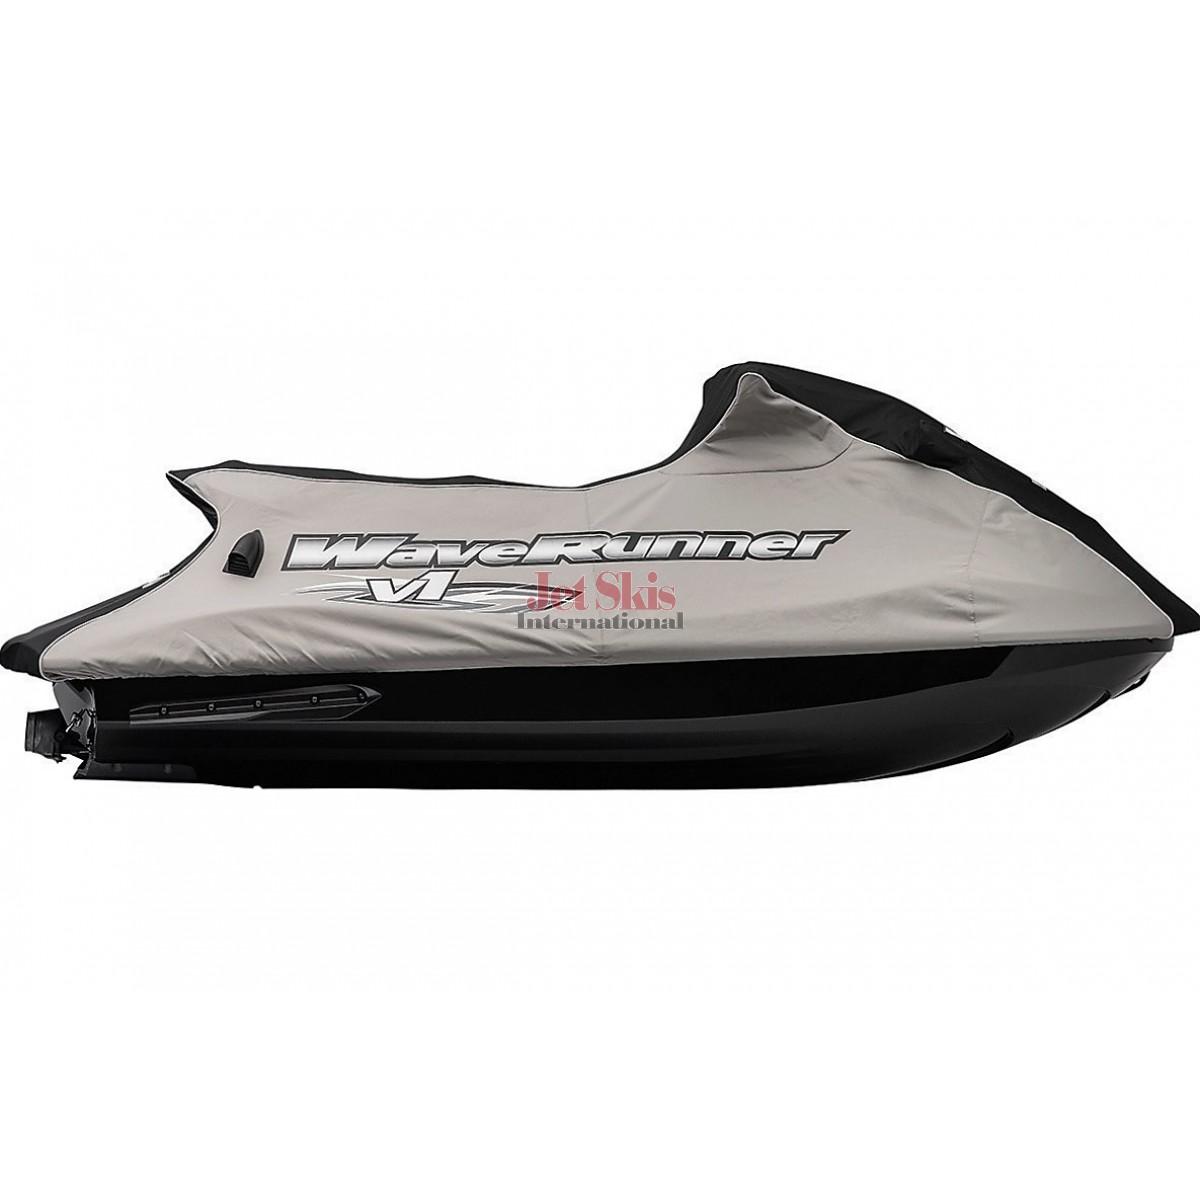 Yamaha jetski pwc 2014 autos post for Yamaha jet skis